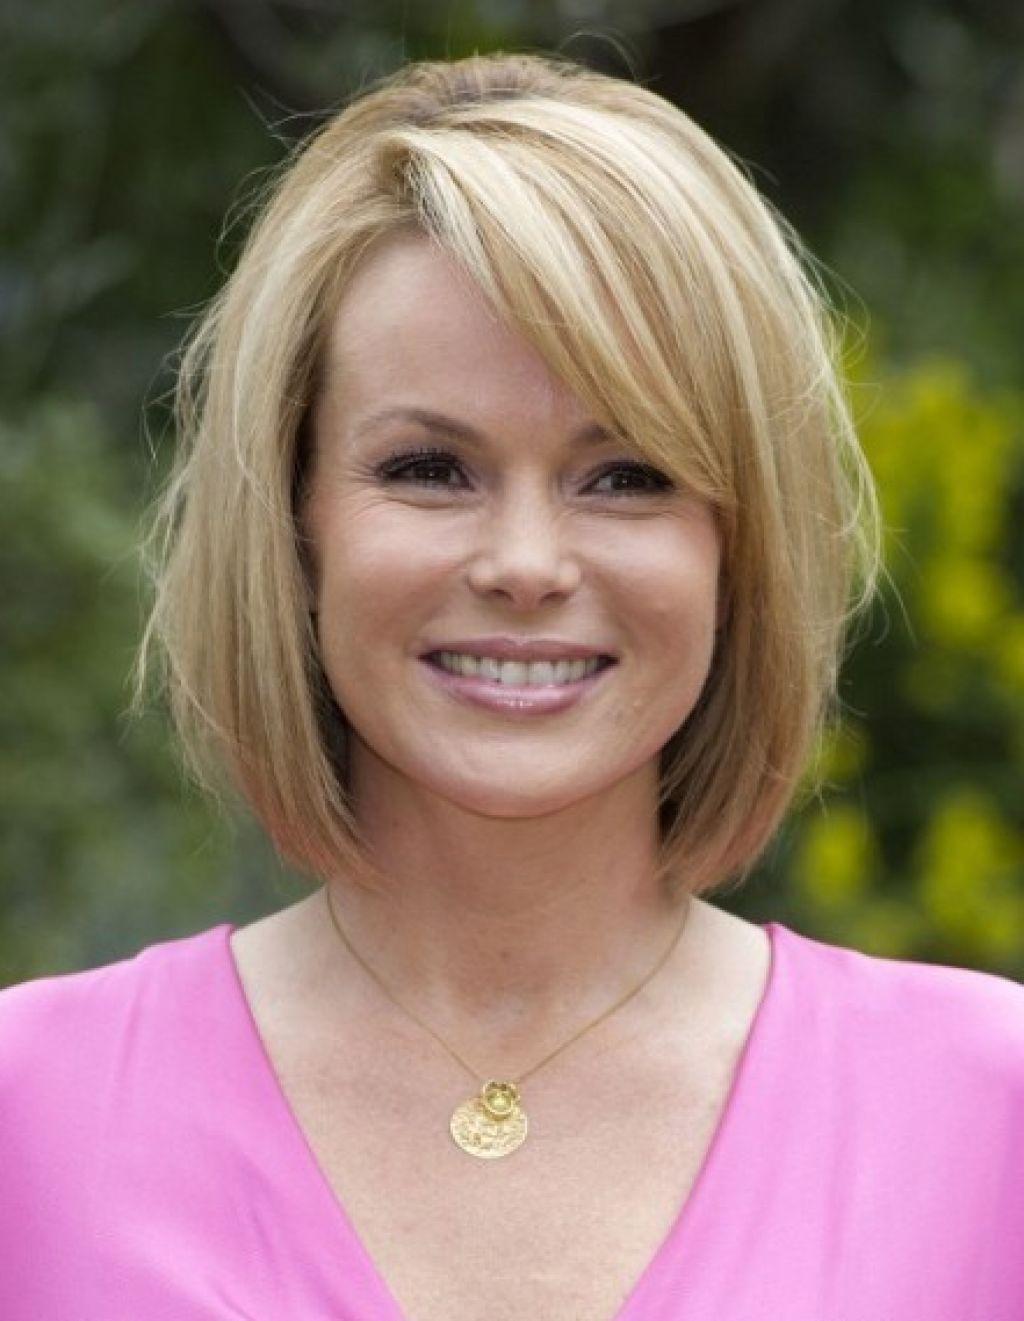 Medium bob hairstyles for women over 50 -